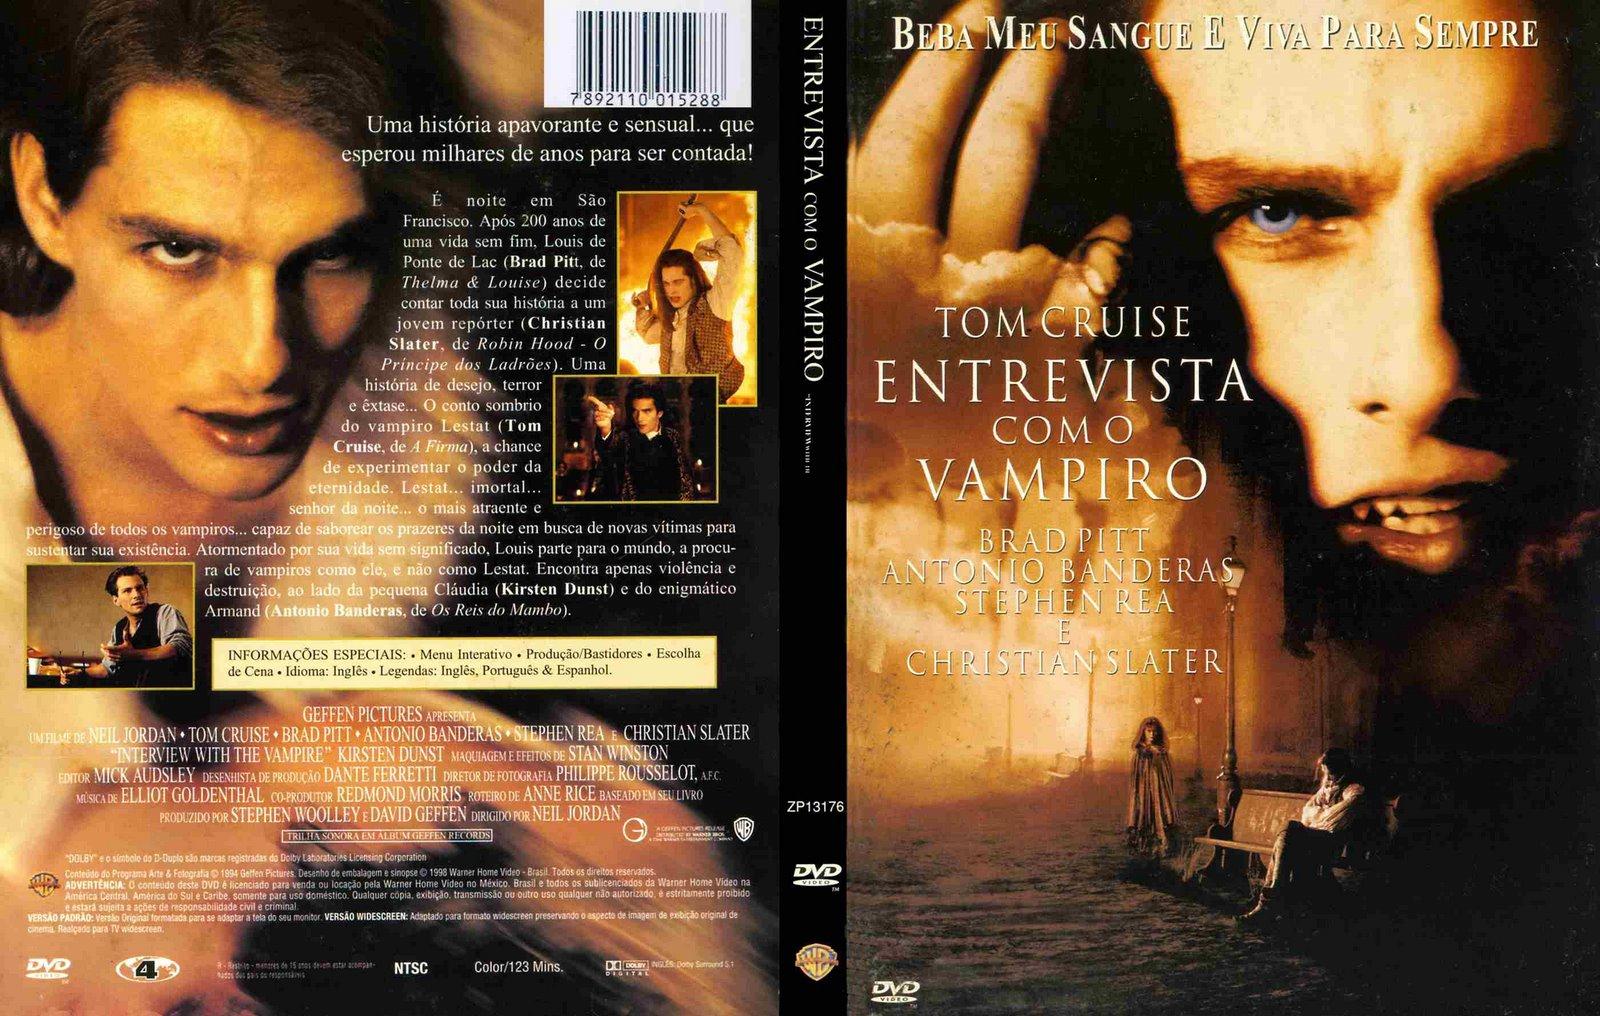 http://1.bp.blogspot.com/--Ybv2I4P0l4/T064ttDNstI/AAAAAAAAA58/XHAlE3m1uXw/s1600/entrevistacomovampiro.jpg